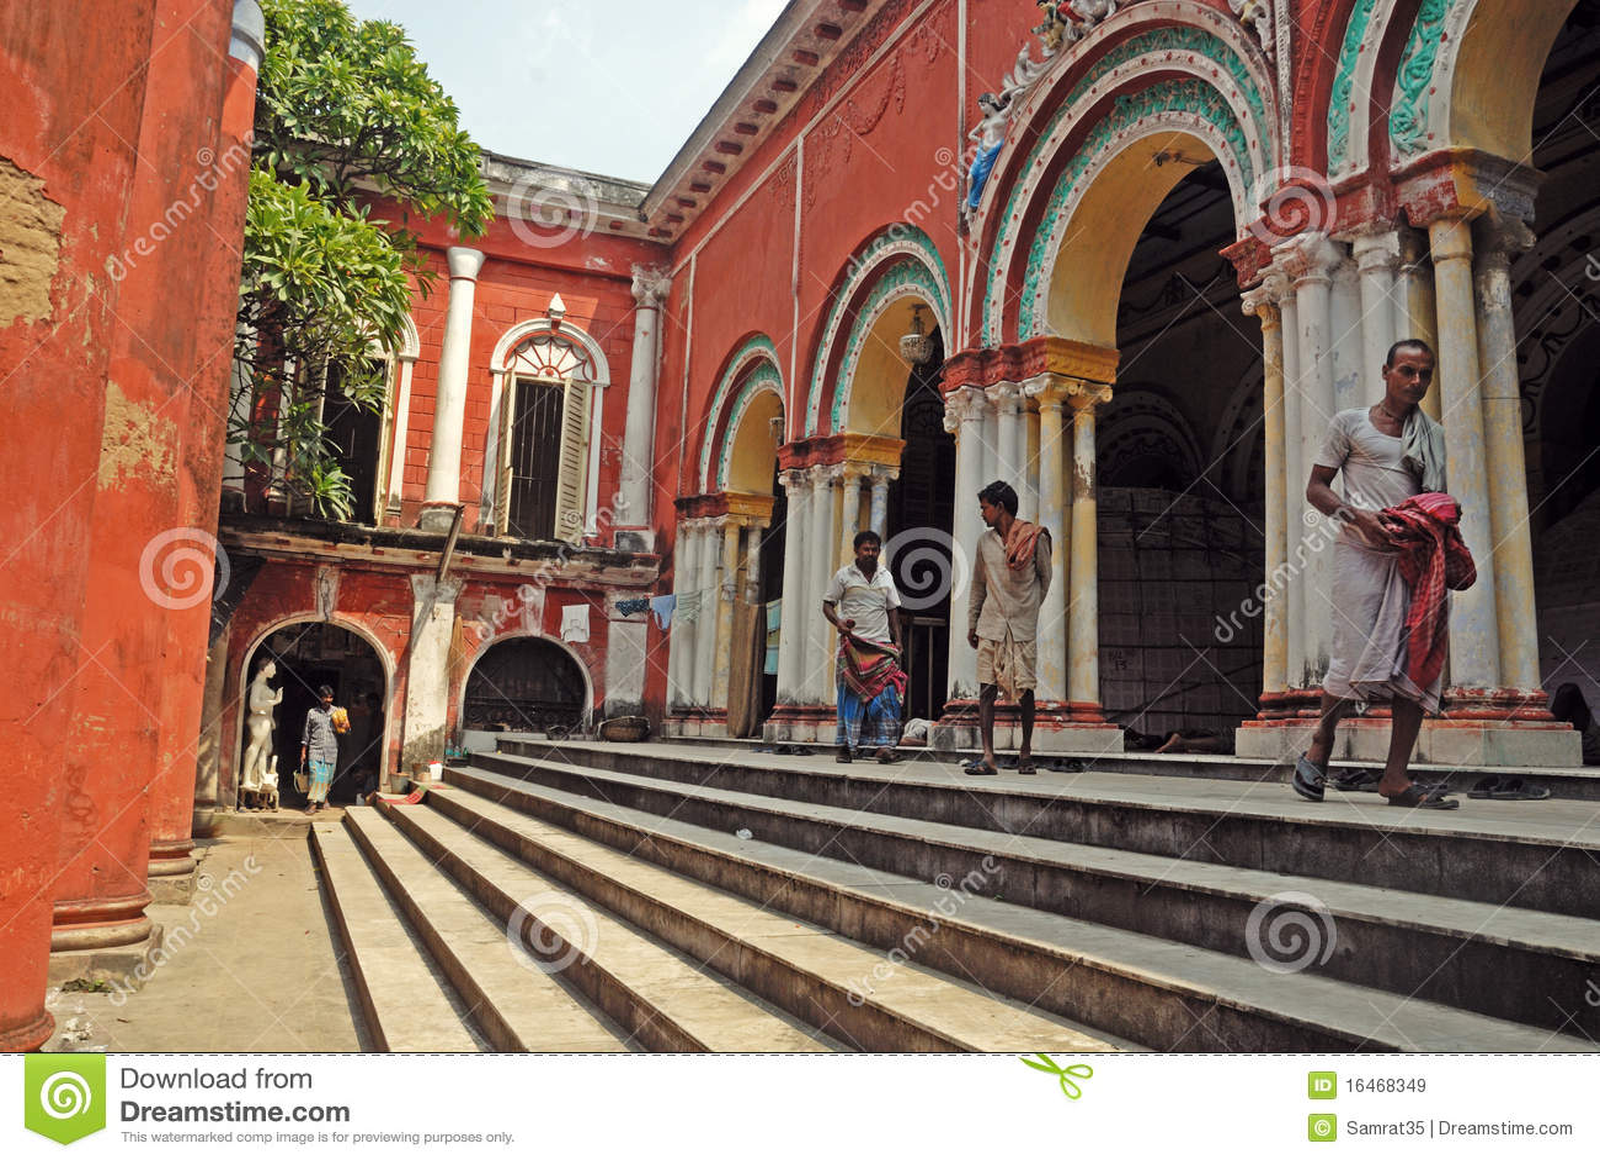 Traditional house of old kolkata editorial stock image for Bangla house photo